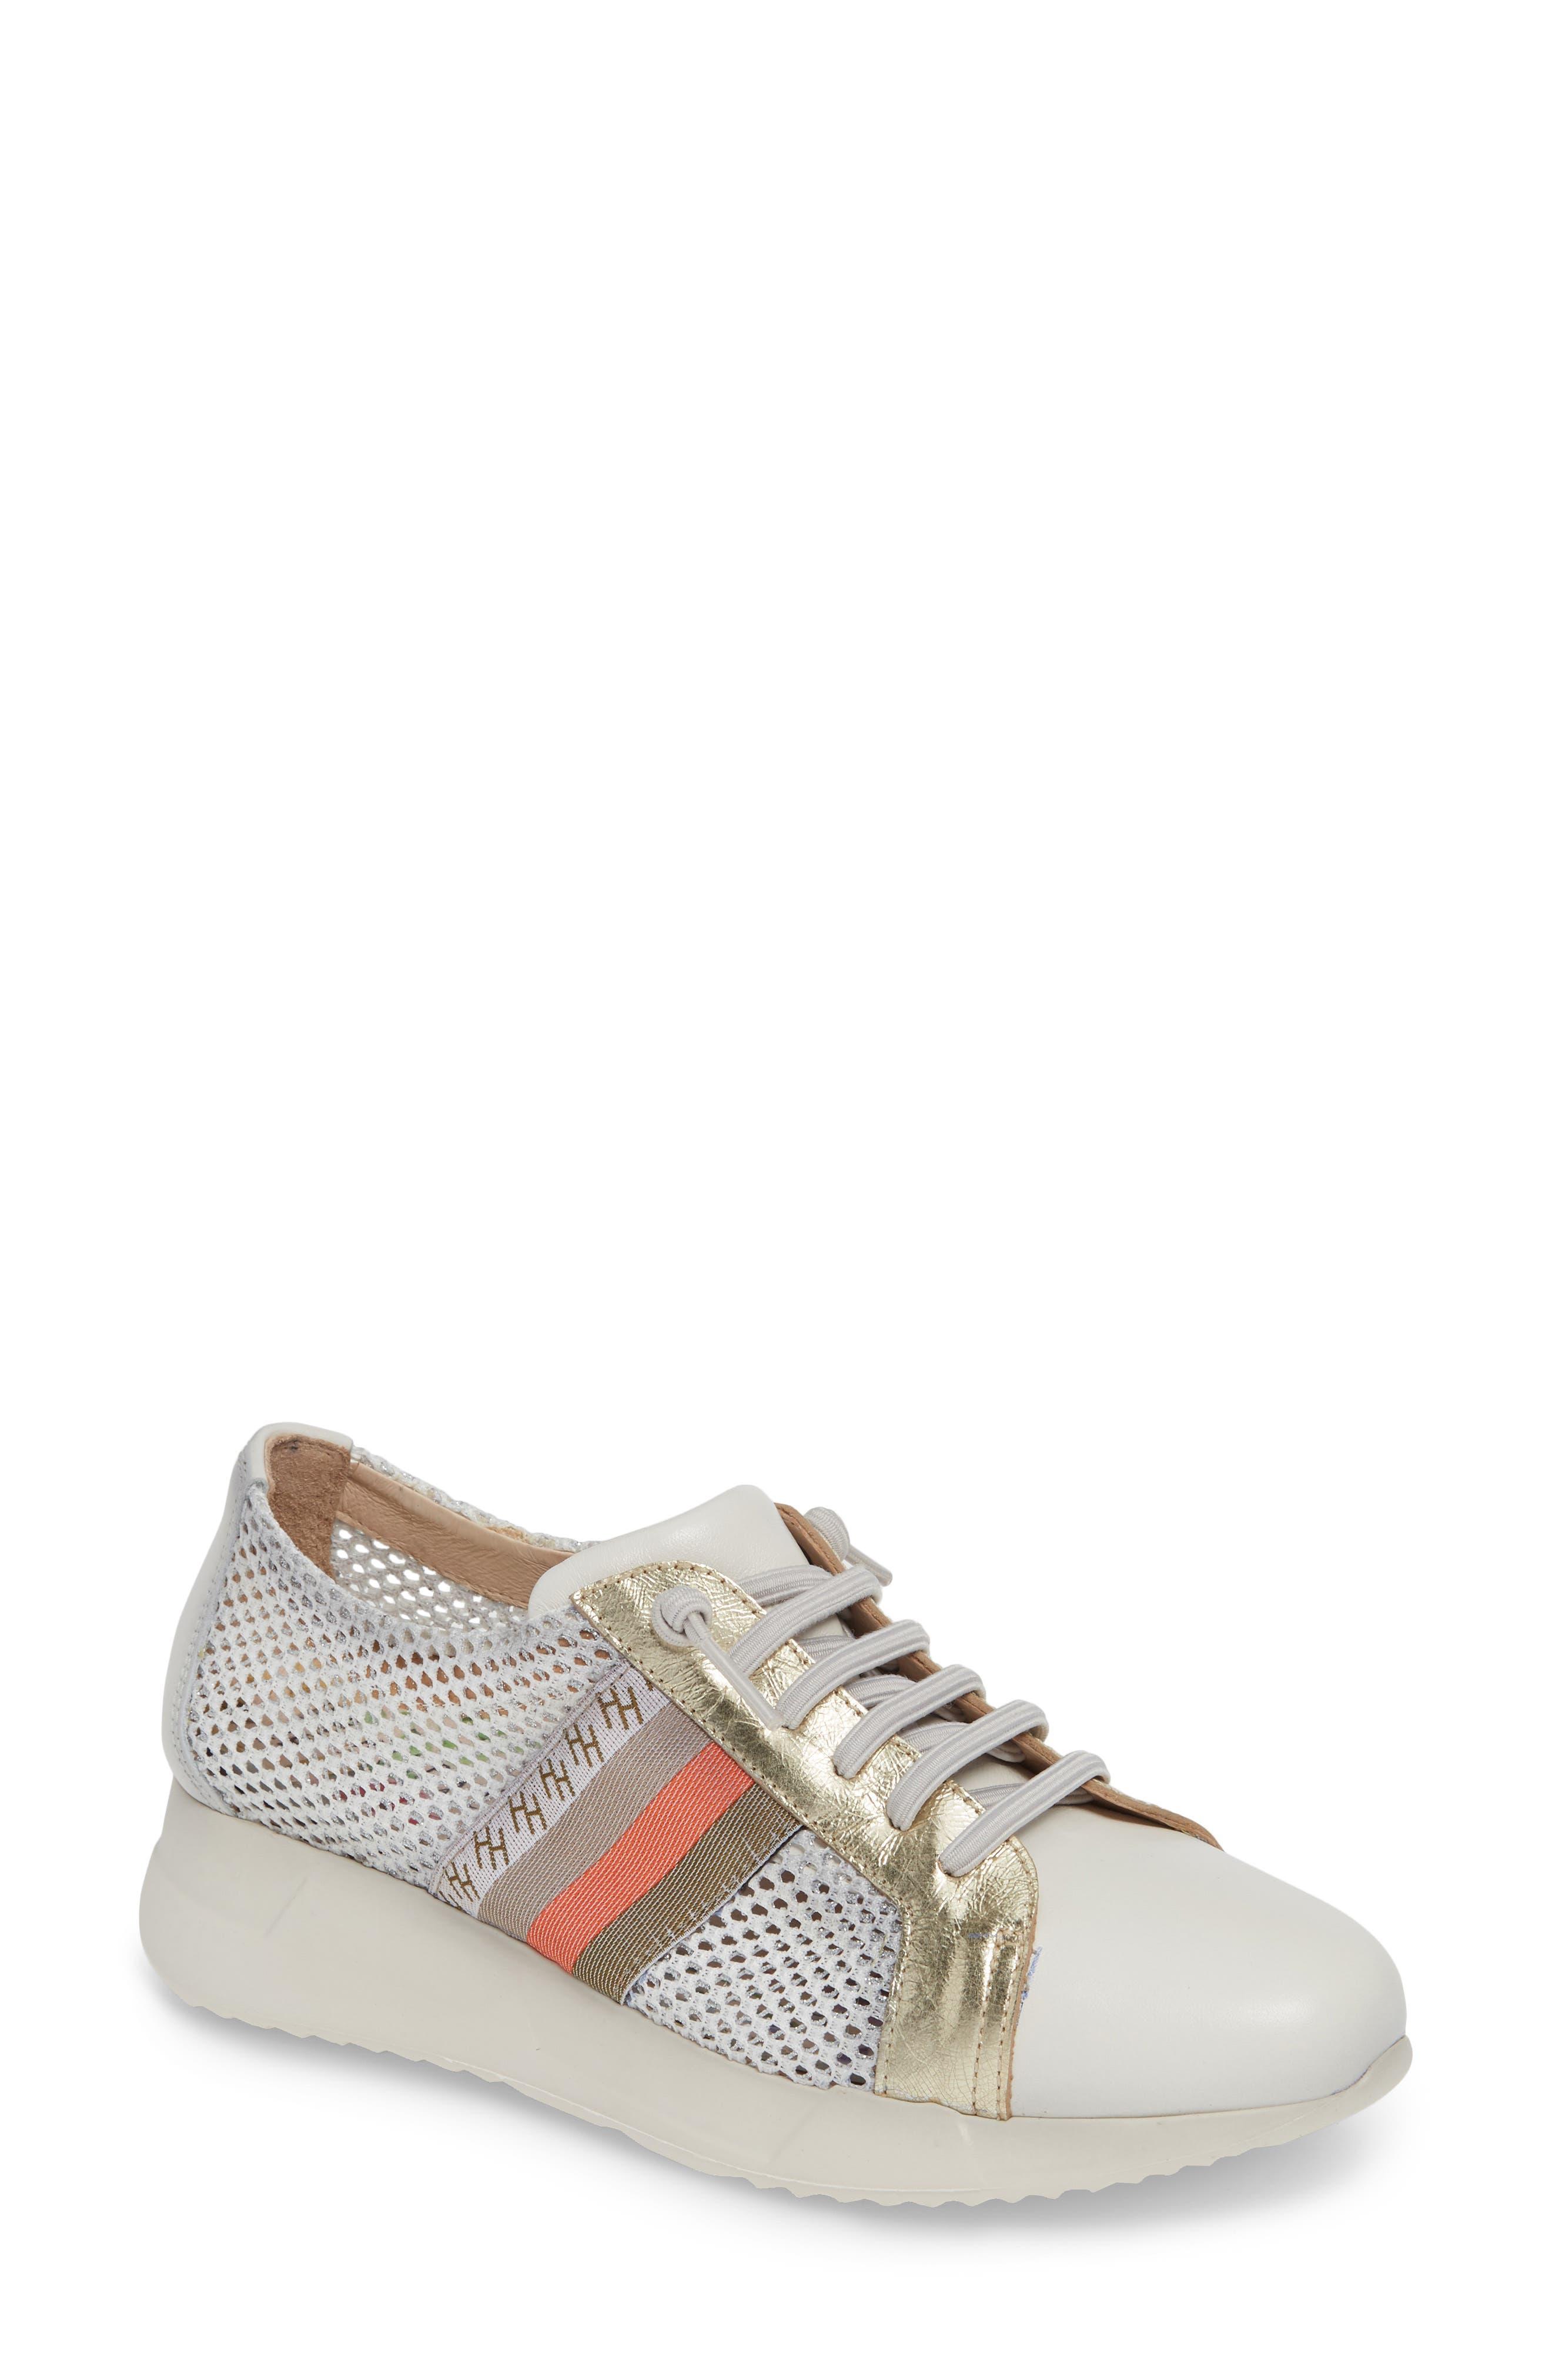 Hispanitas Stephanie Platform Sneaker - White